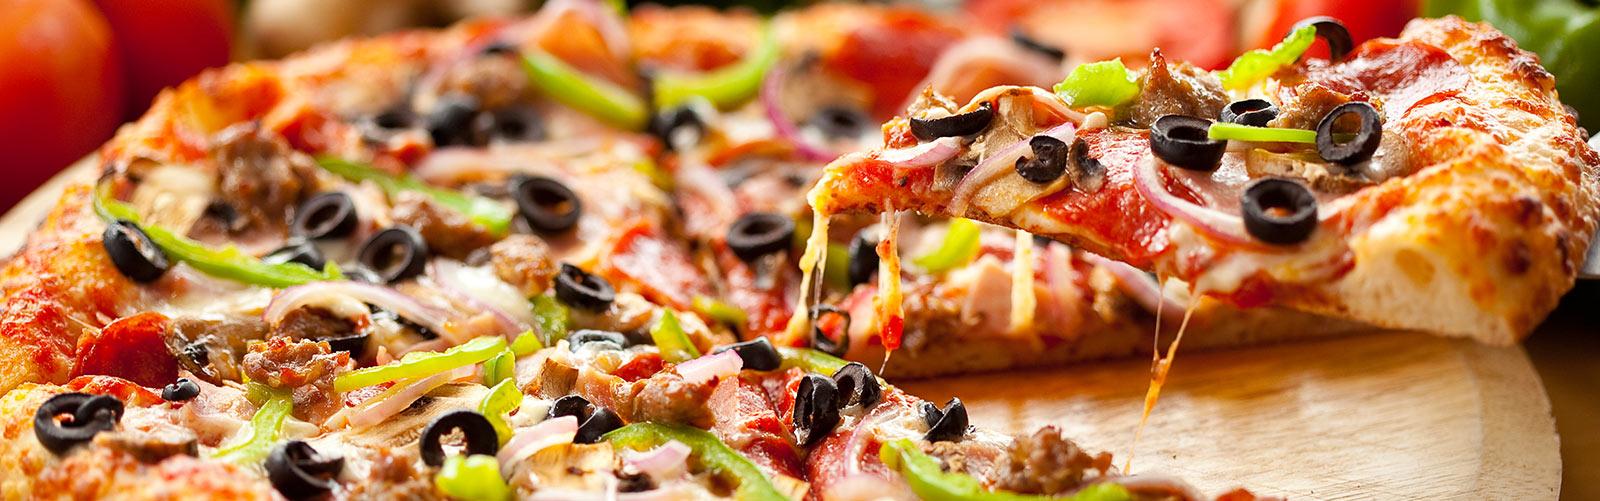 Tonys Kebab Pizza House Tonys Kebab Pizza House